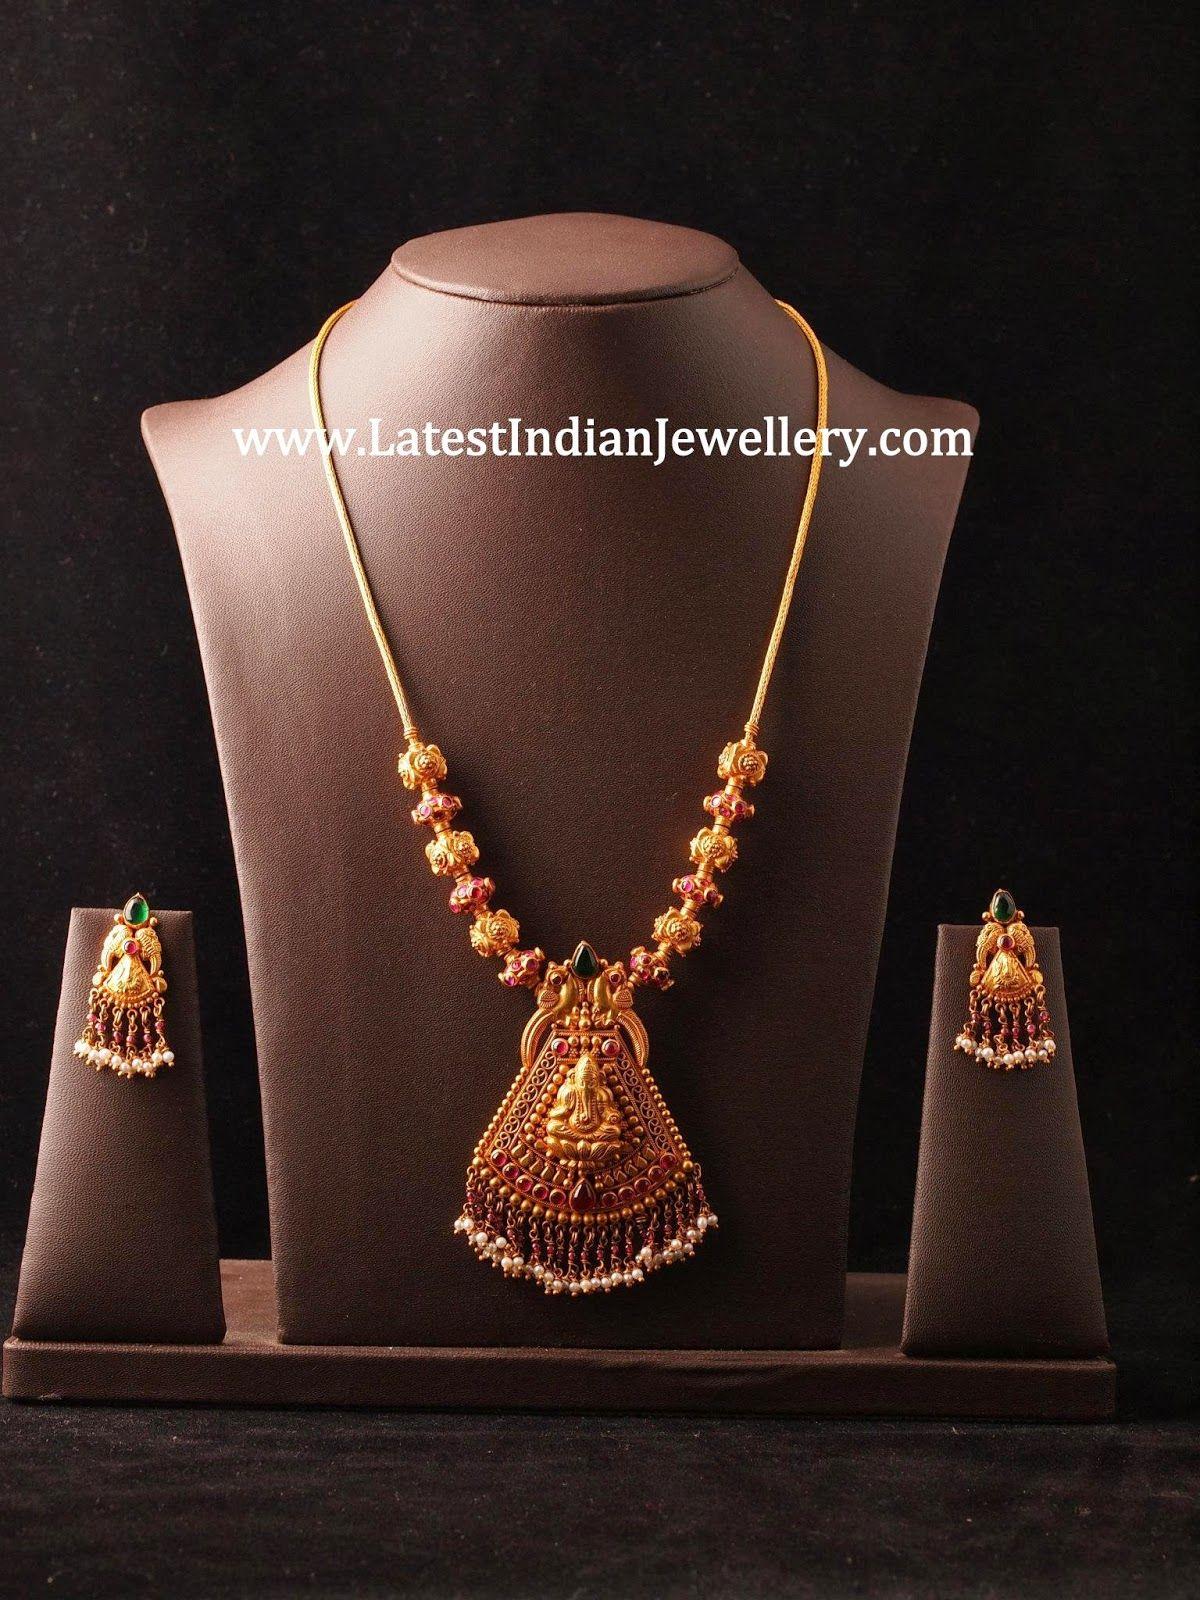 simple temple jewellery design necklace haaram designs. Black Bedroom Furniture Sets. Home Design Ideas